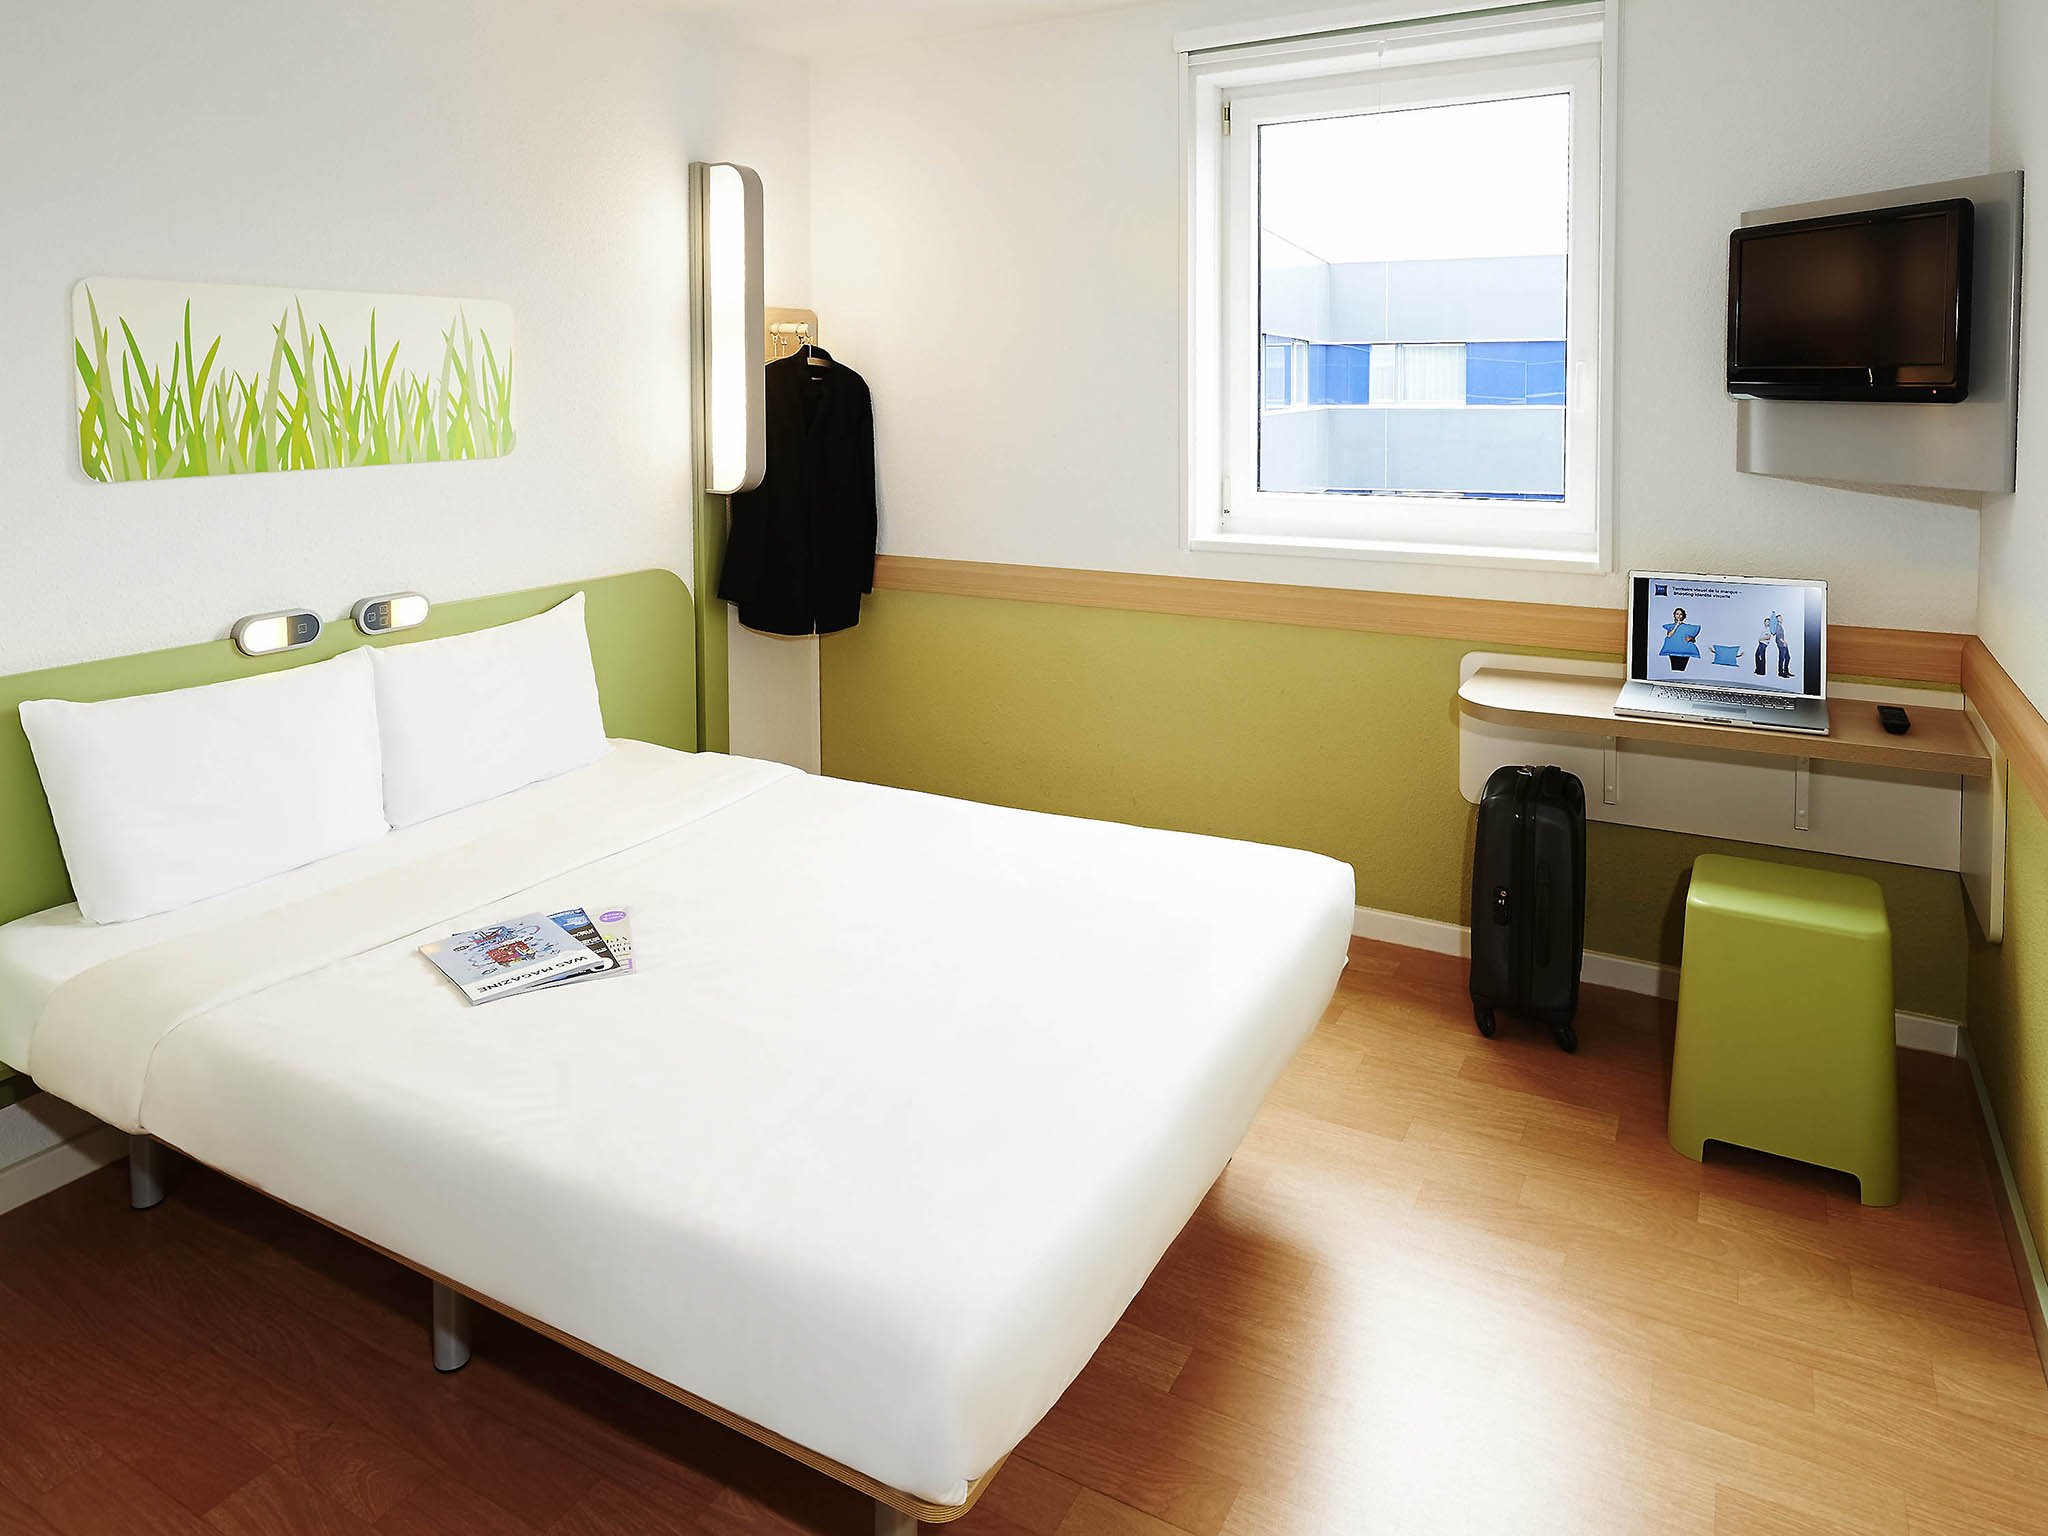 Hotel in YUTZ ibis bud Thionville Yutz les Trois Fronti¨res